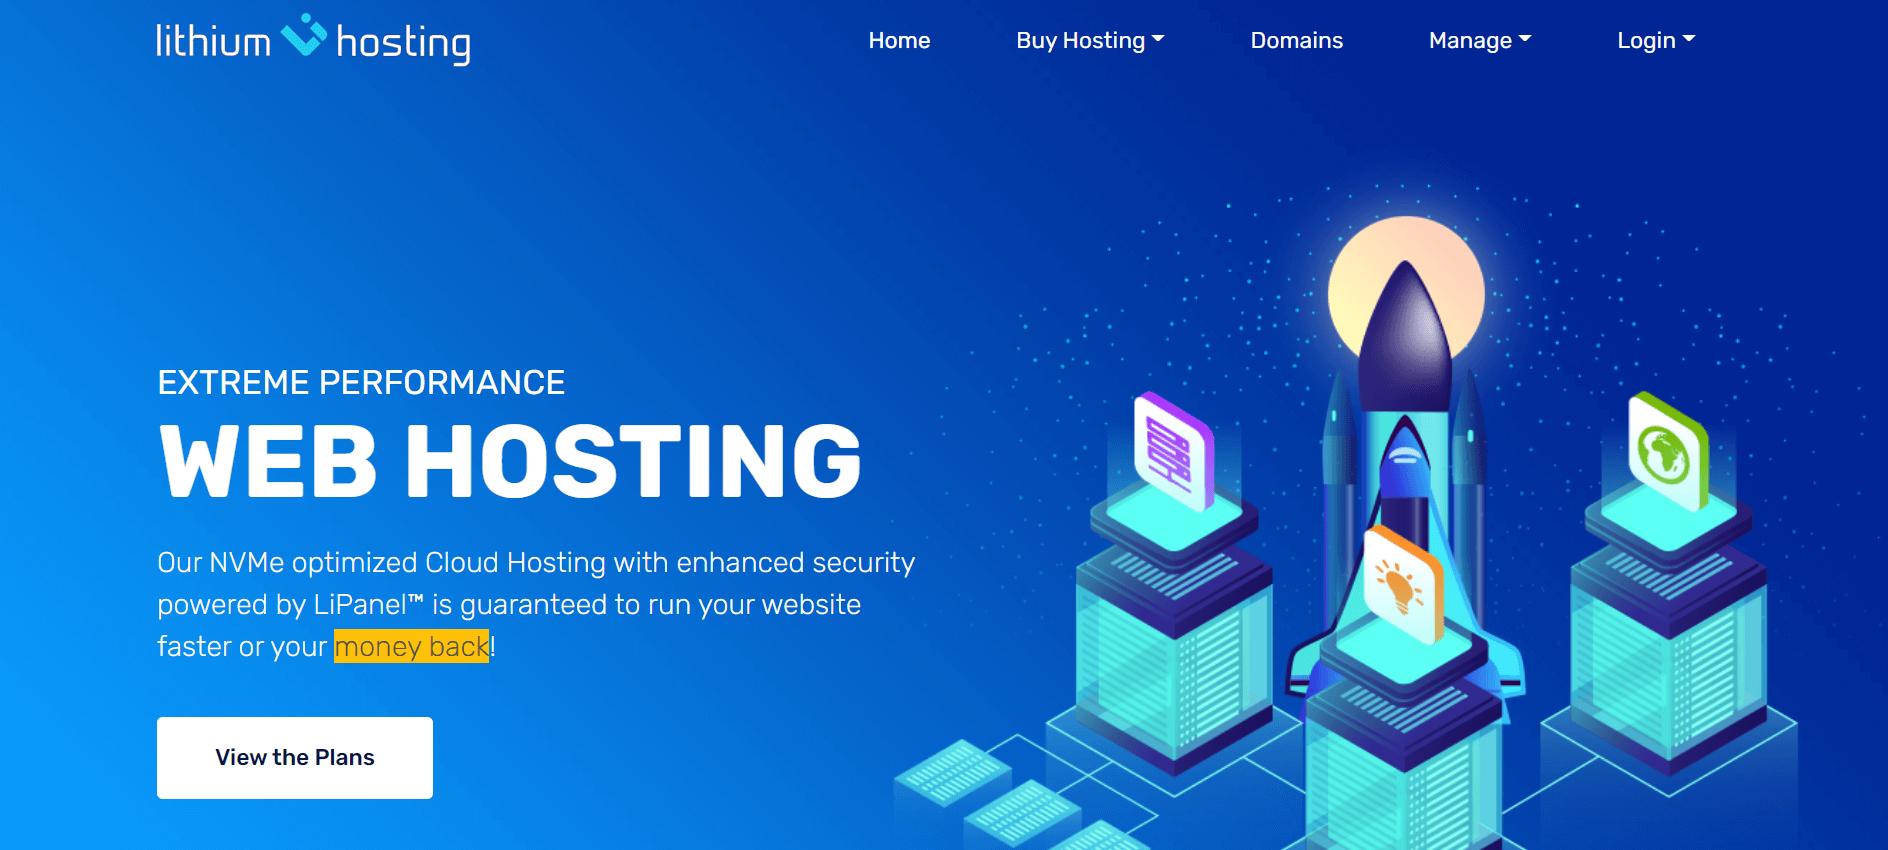 lithium hosting free trial